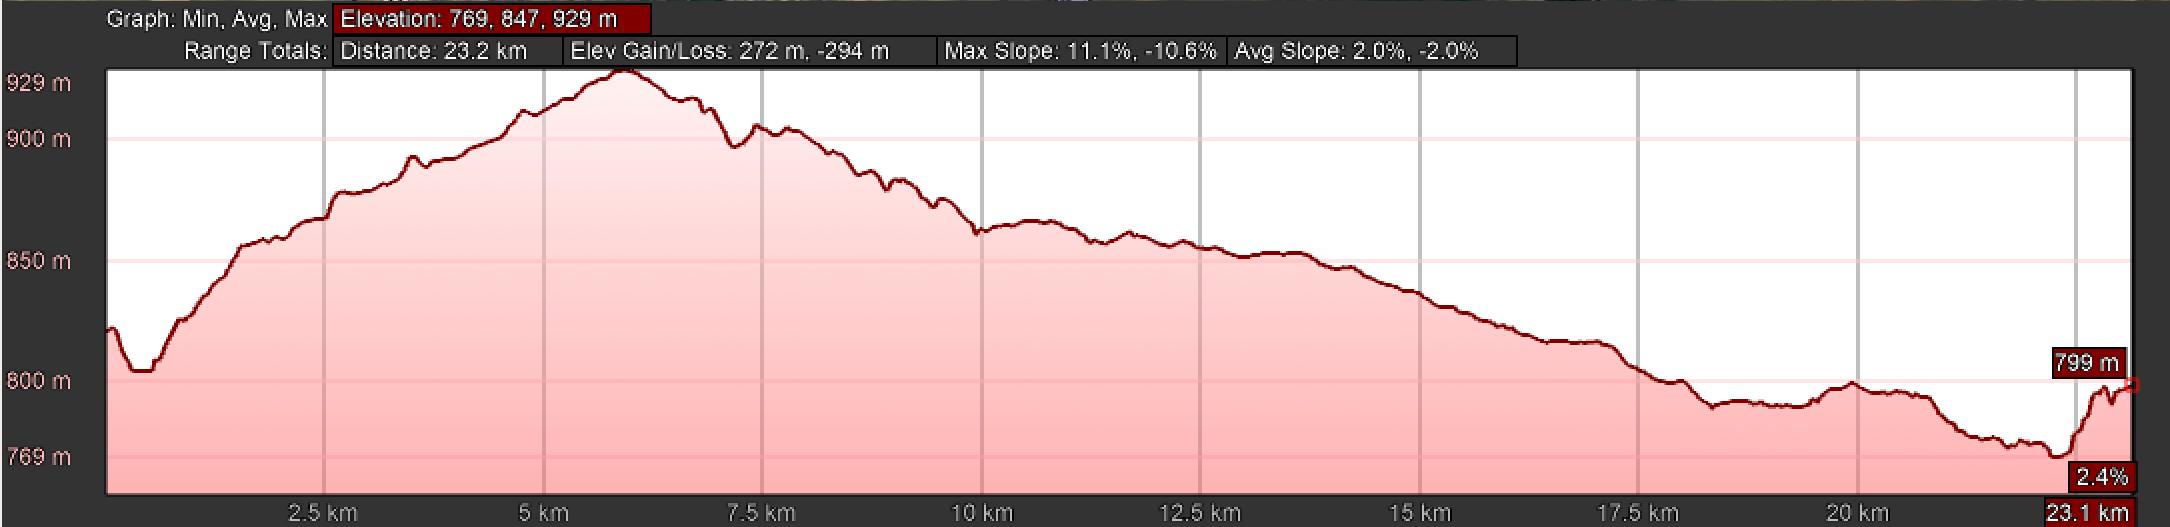 Elevation Profile Camino Natural Via de la Plata